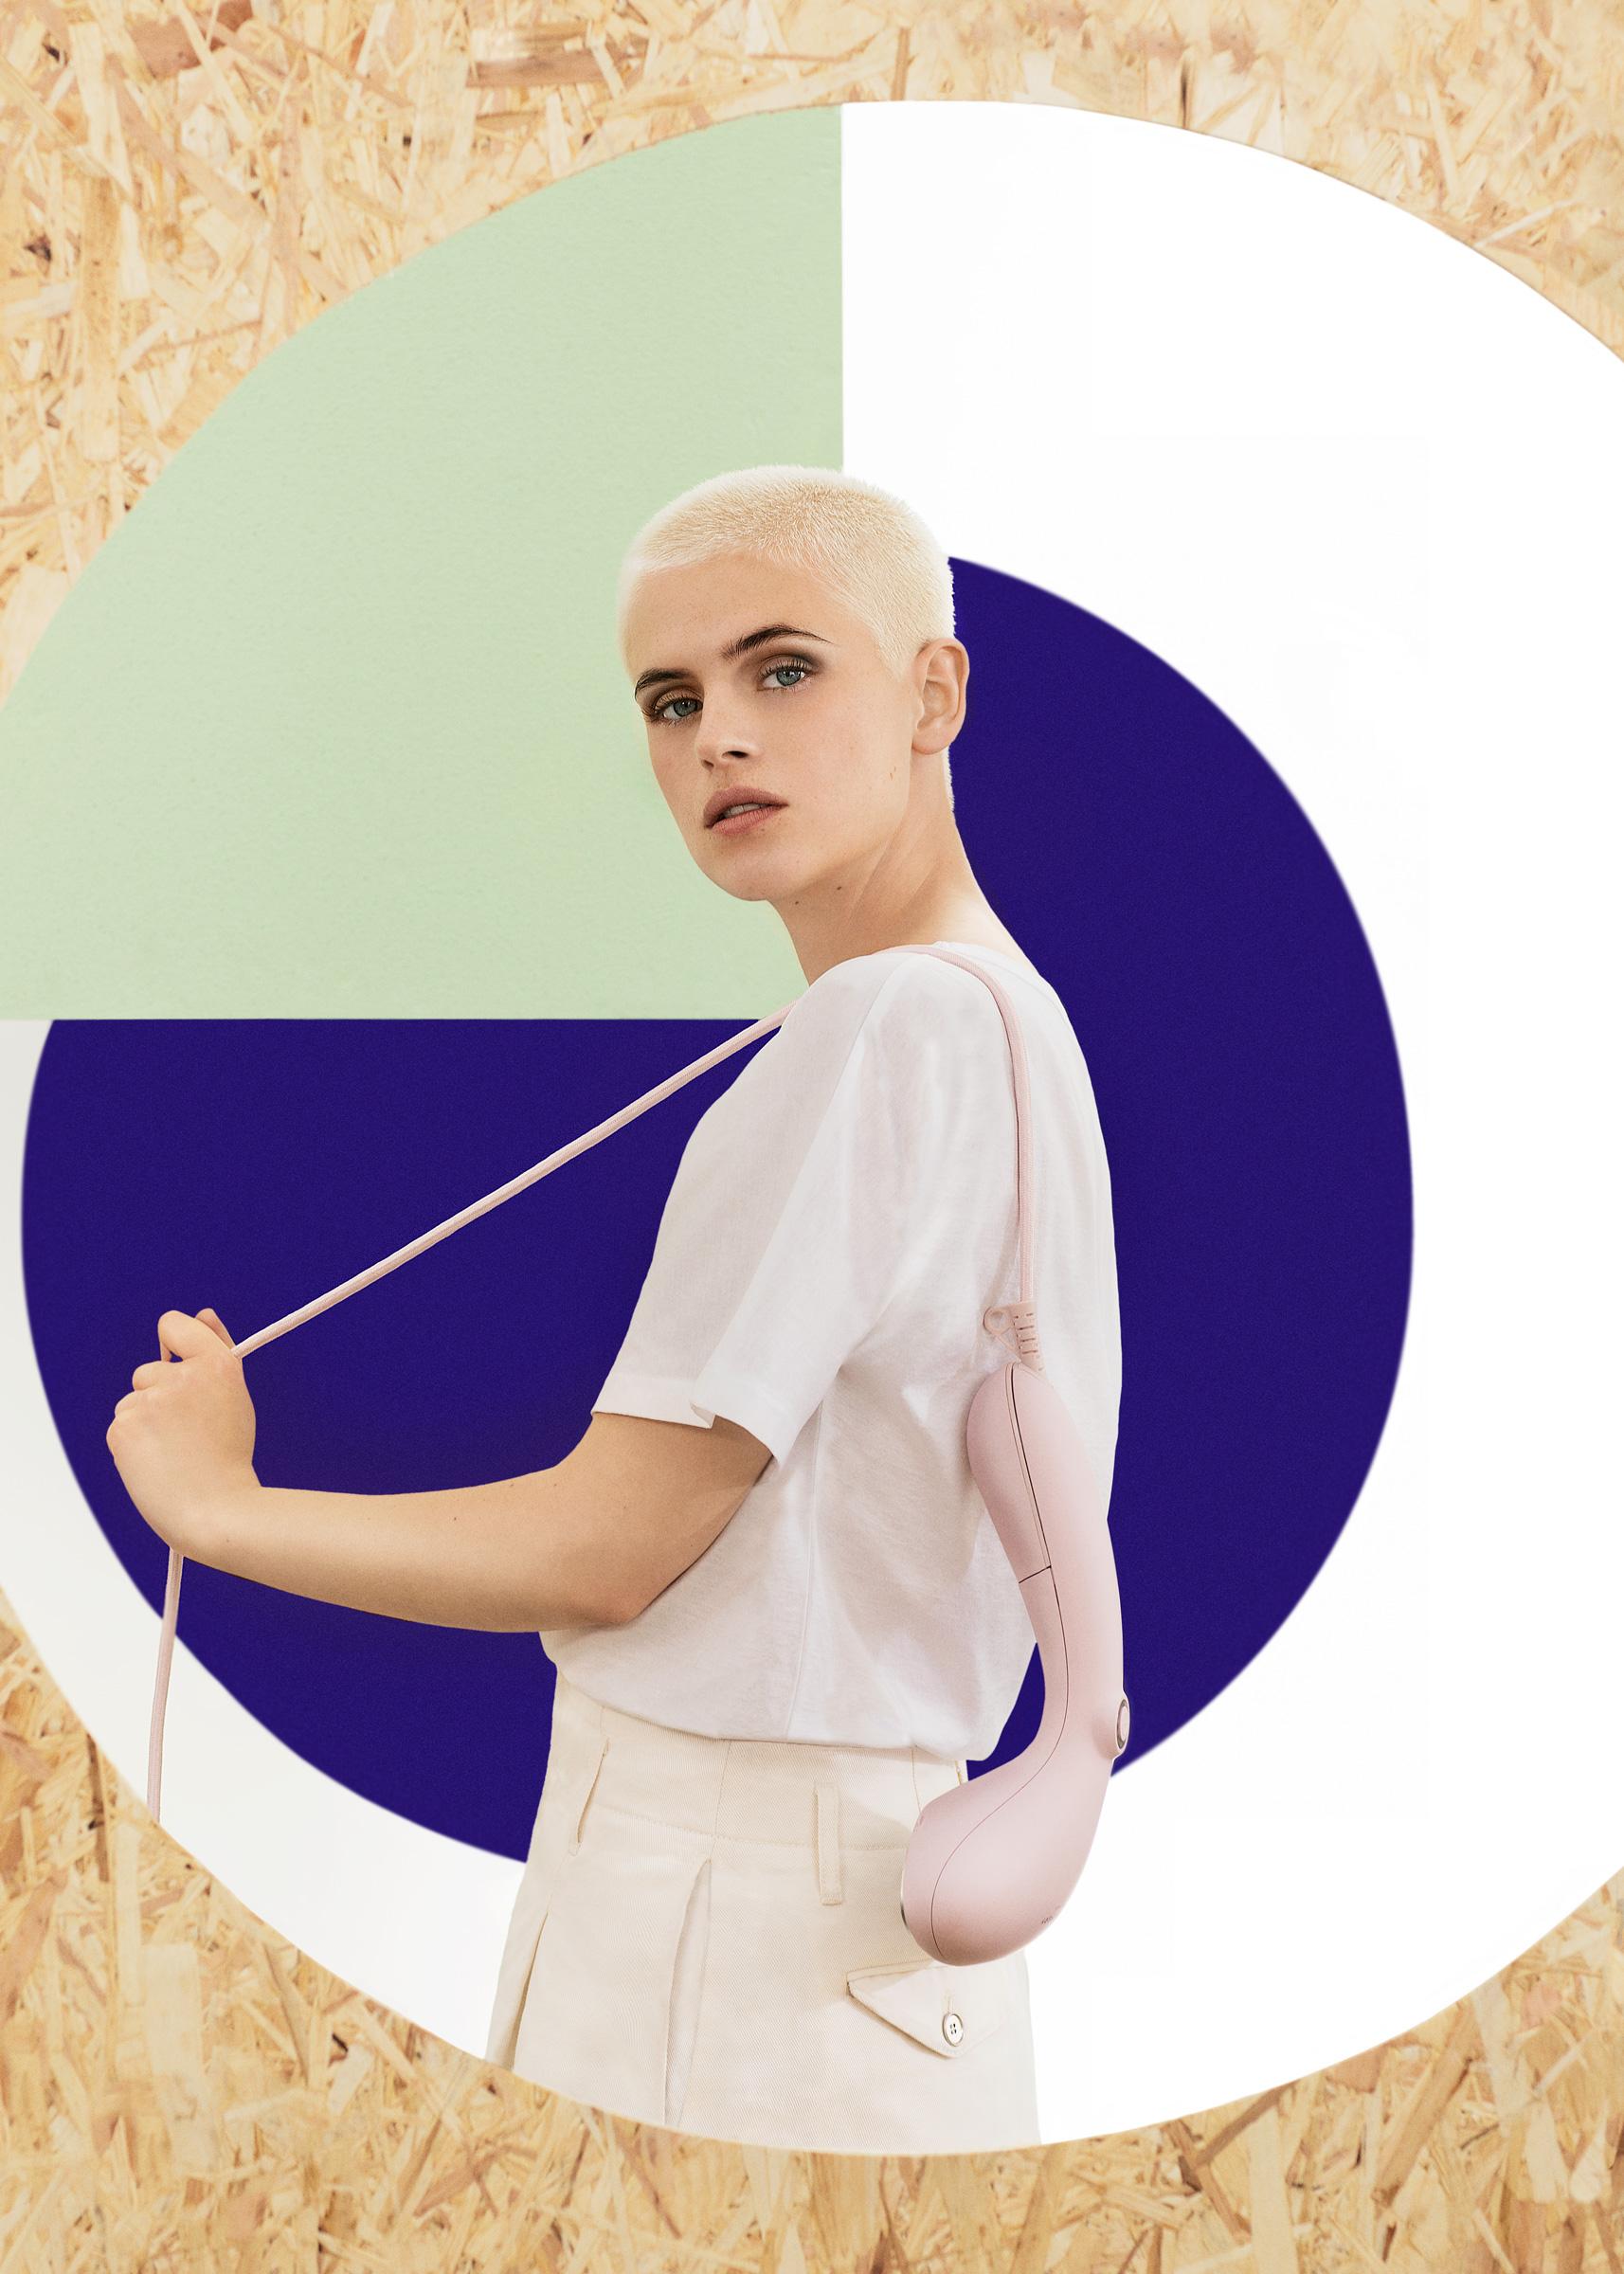 Kvinnlig modell visar upp Steamery Stockholms produkter fotograferad i studio